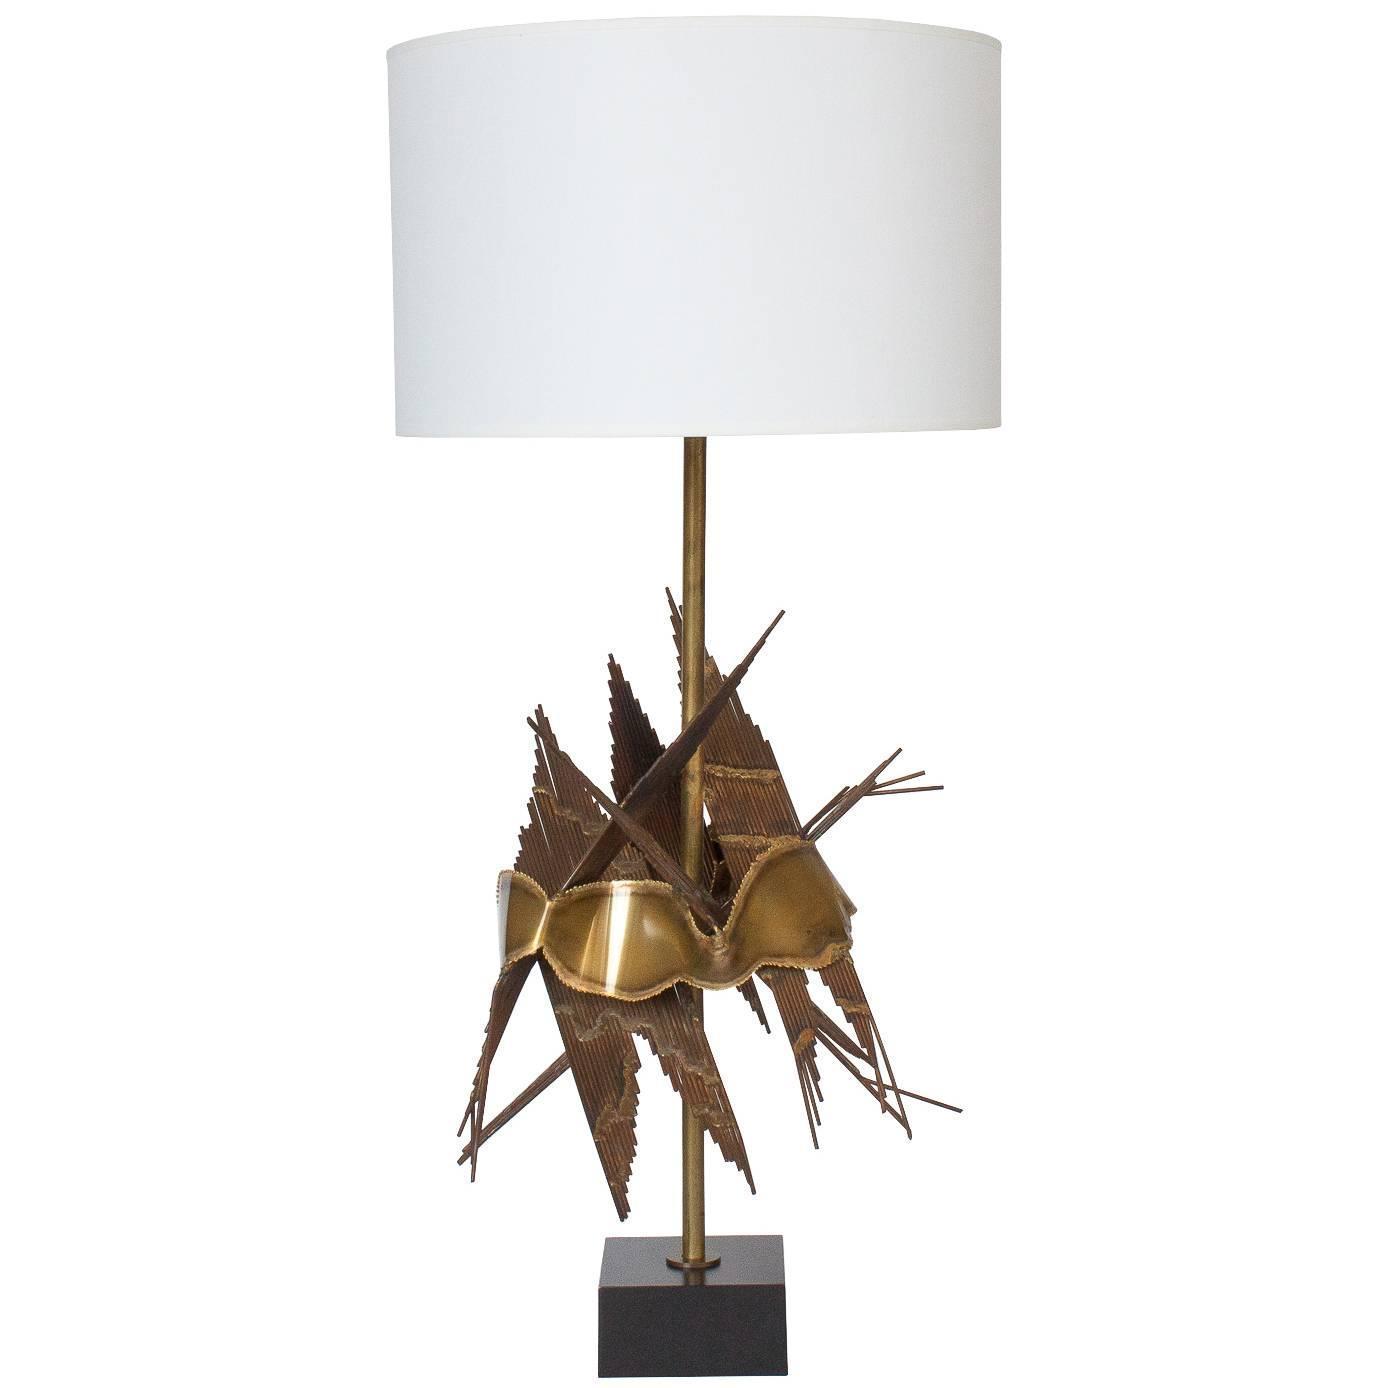 Tom Greene Brutalist Metal Table Lamp at 1stdibs